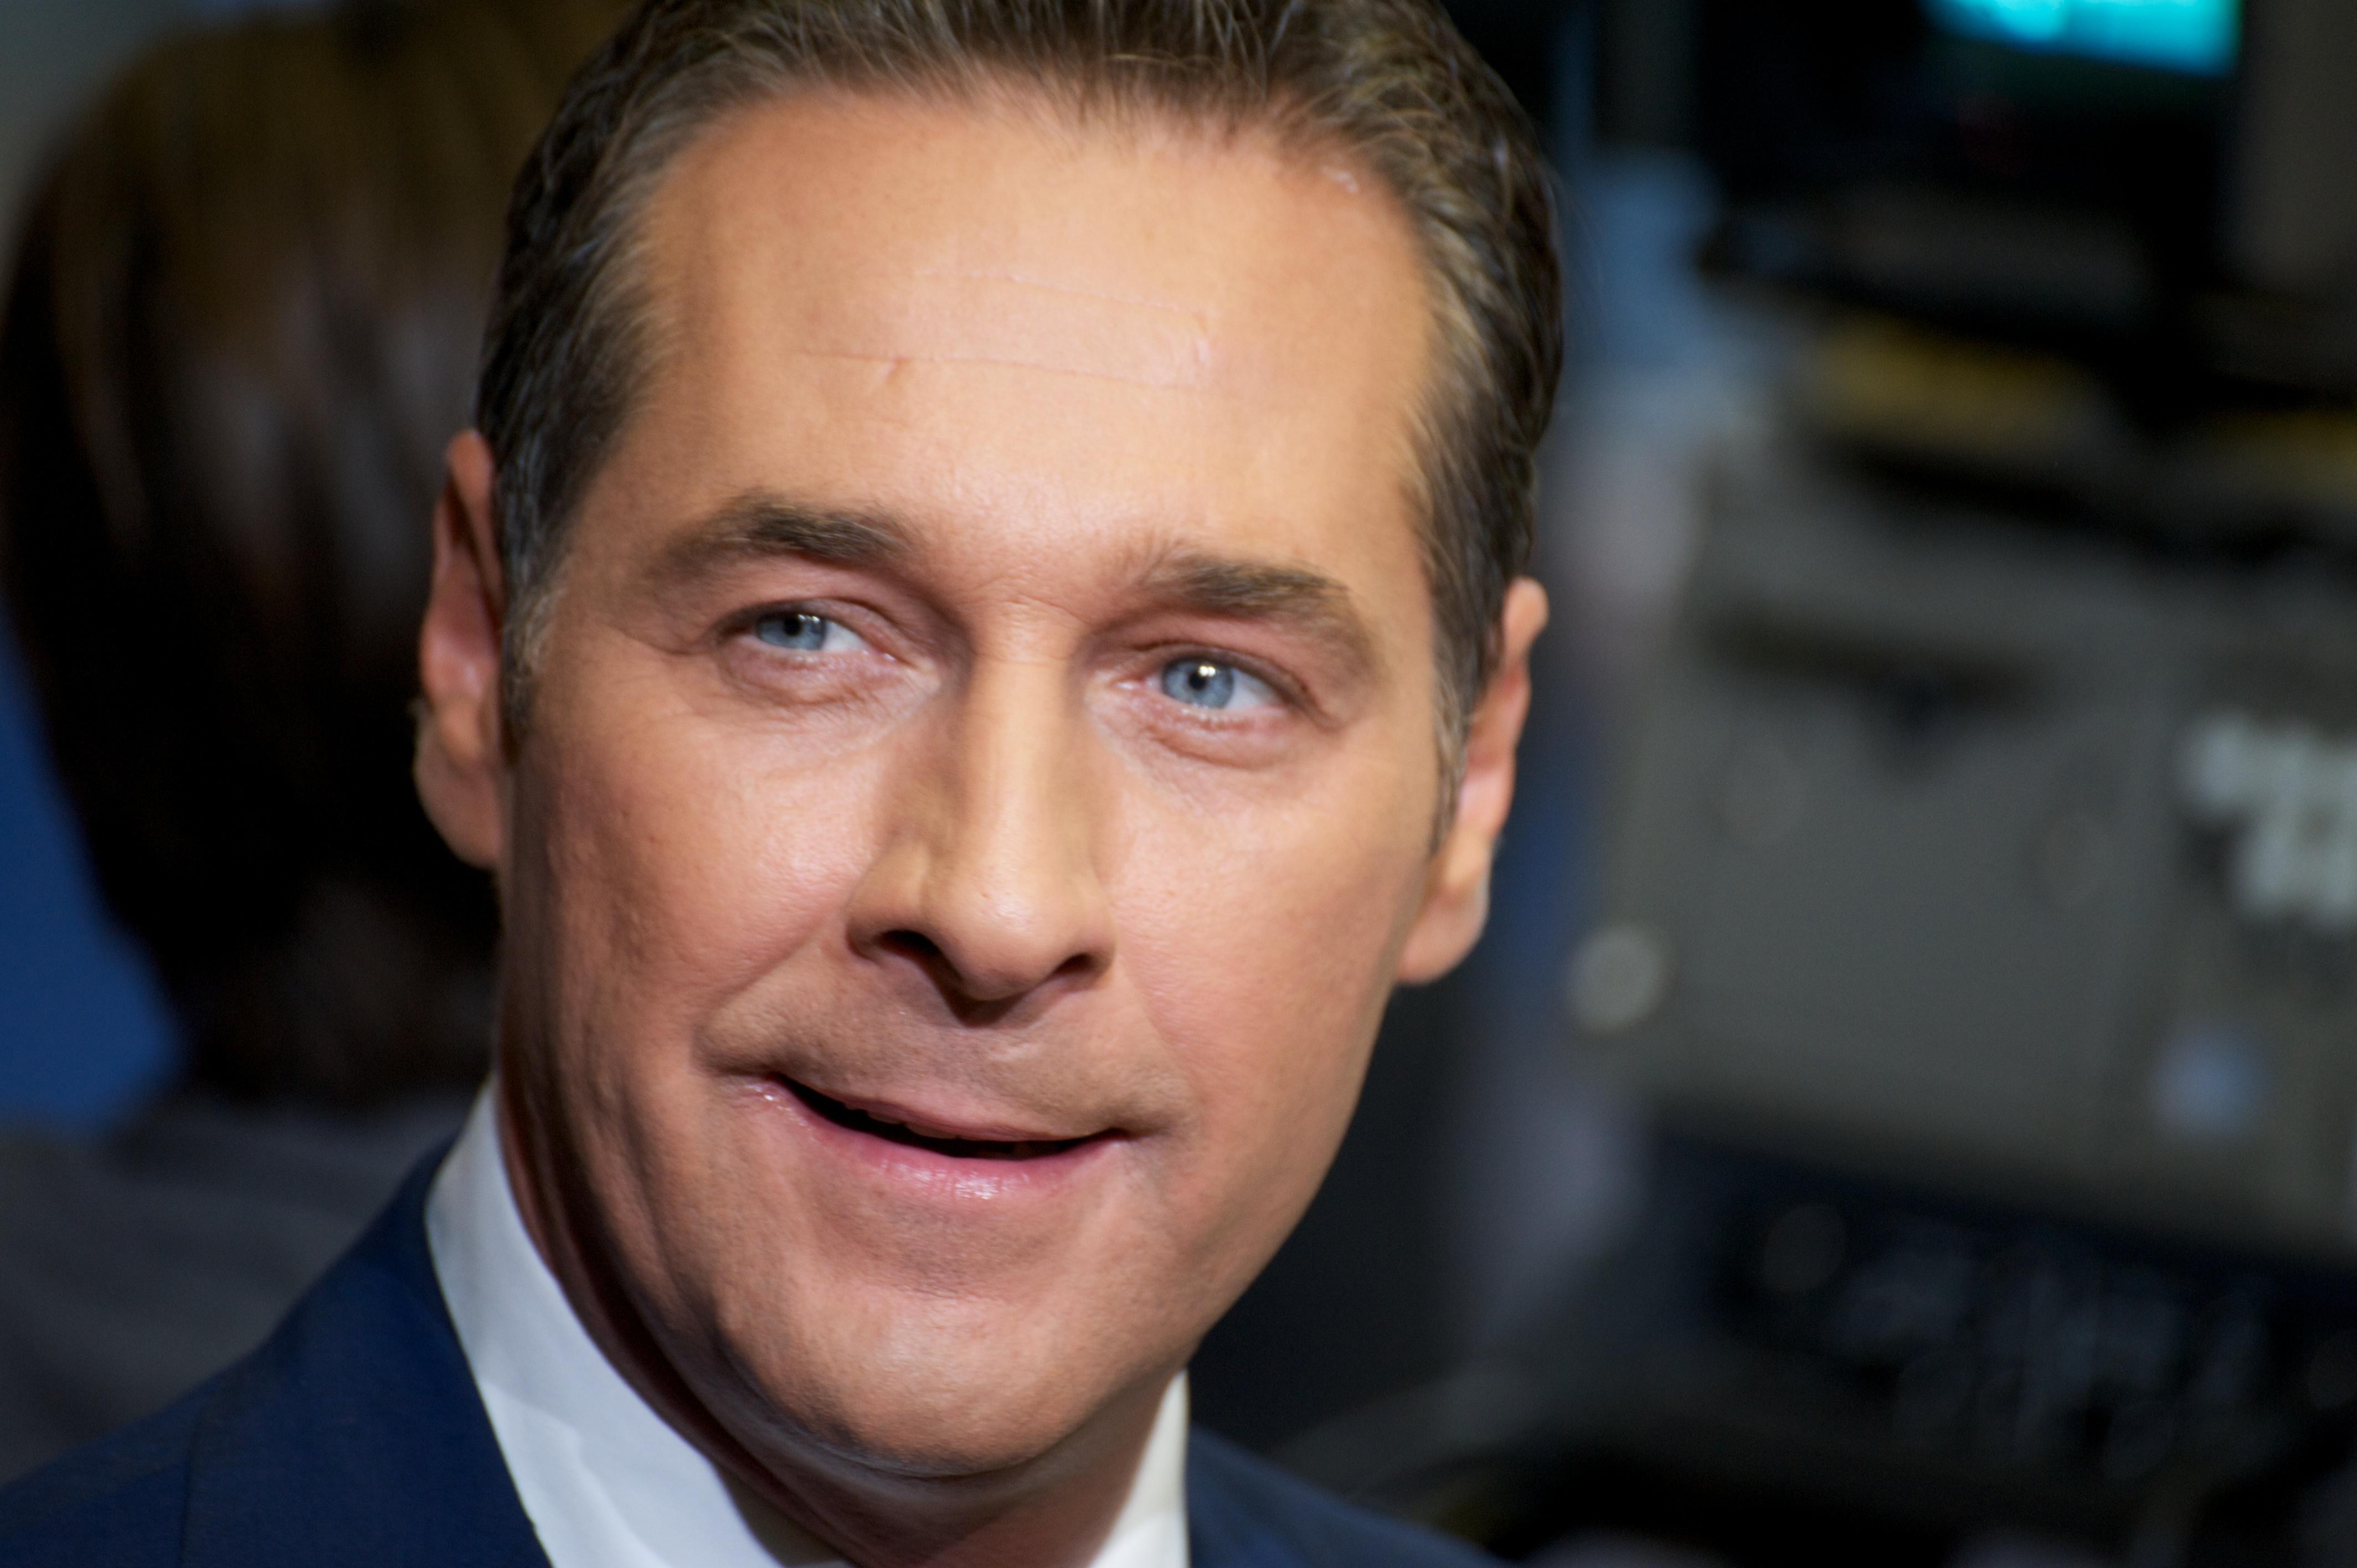 Austria's Vice-Chancellor resigns days before European Parliament elections